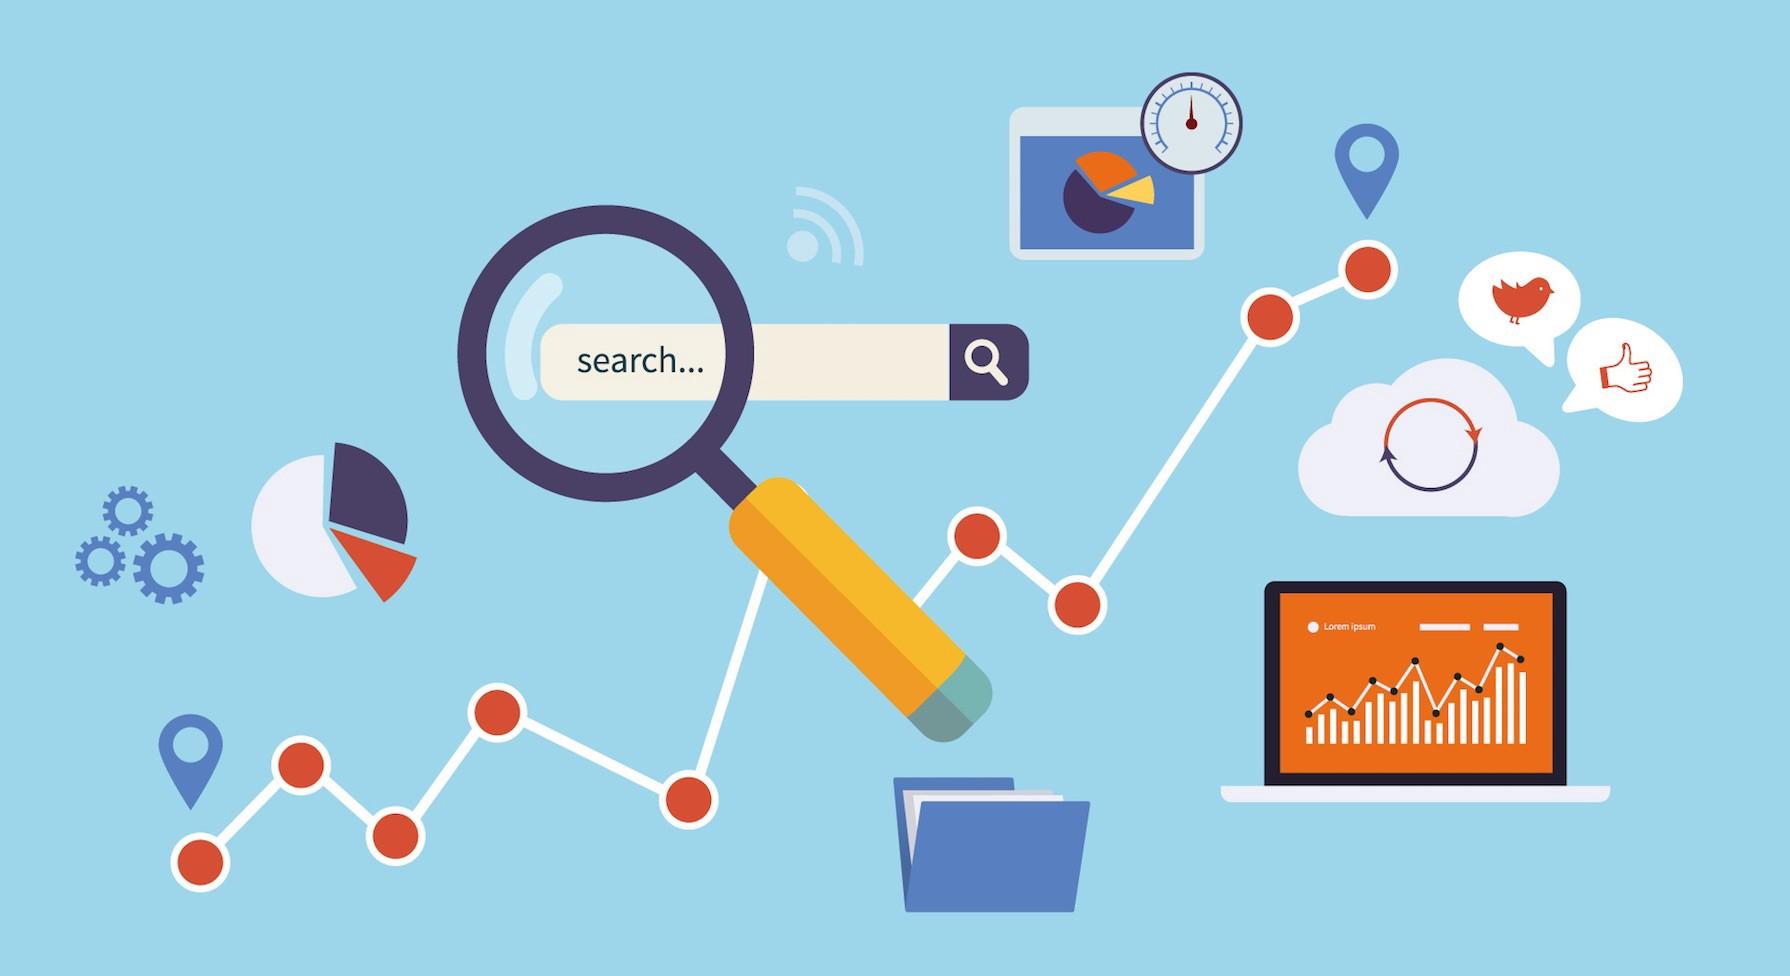 Universities Work Hard on Increasing Their Search Rankings